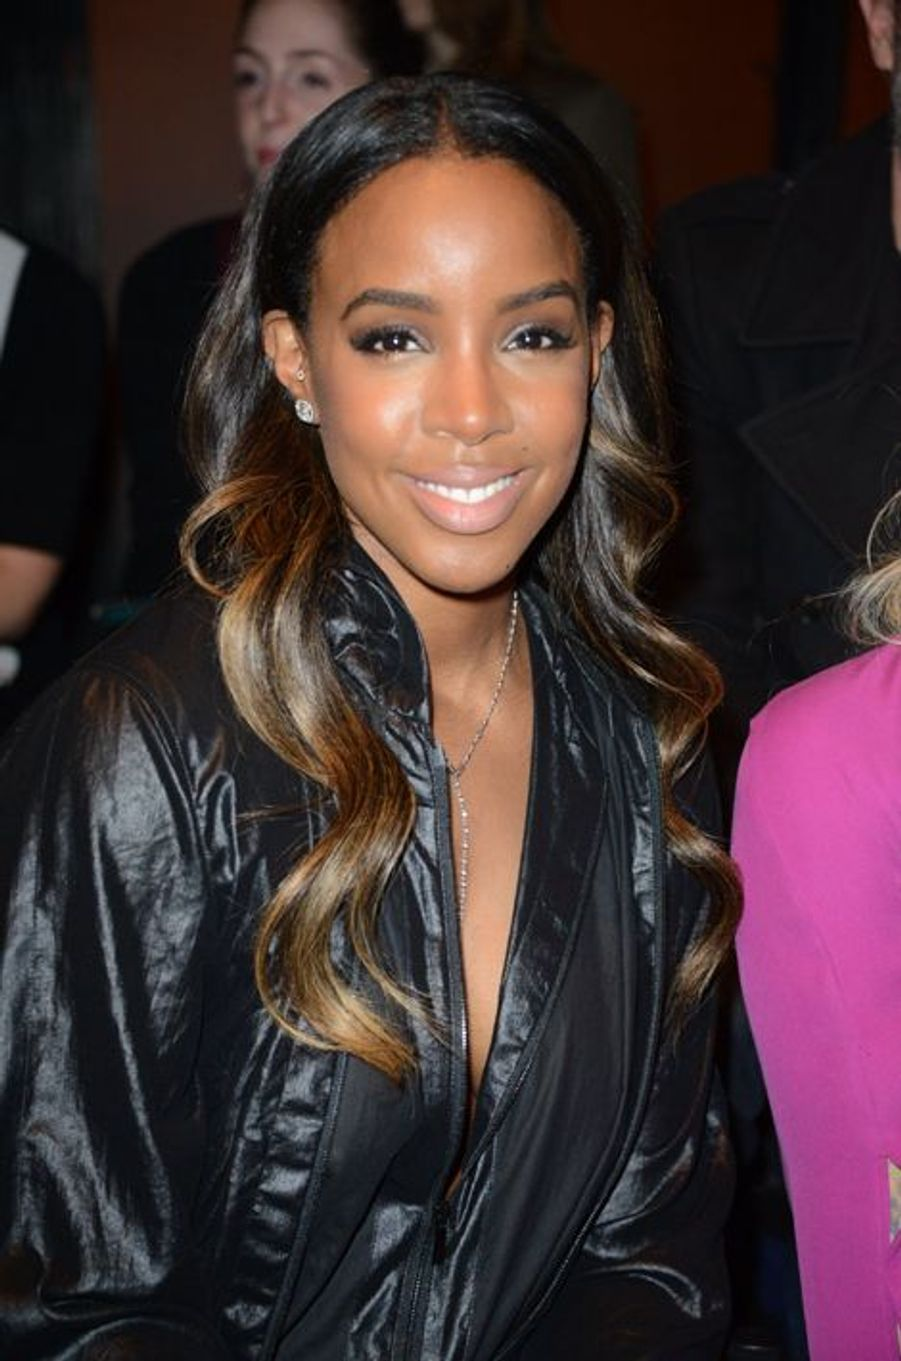 Kelly Rowland au défilé Barbara Bui